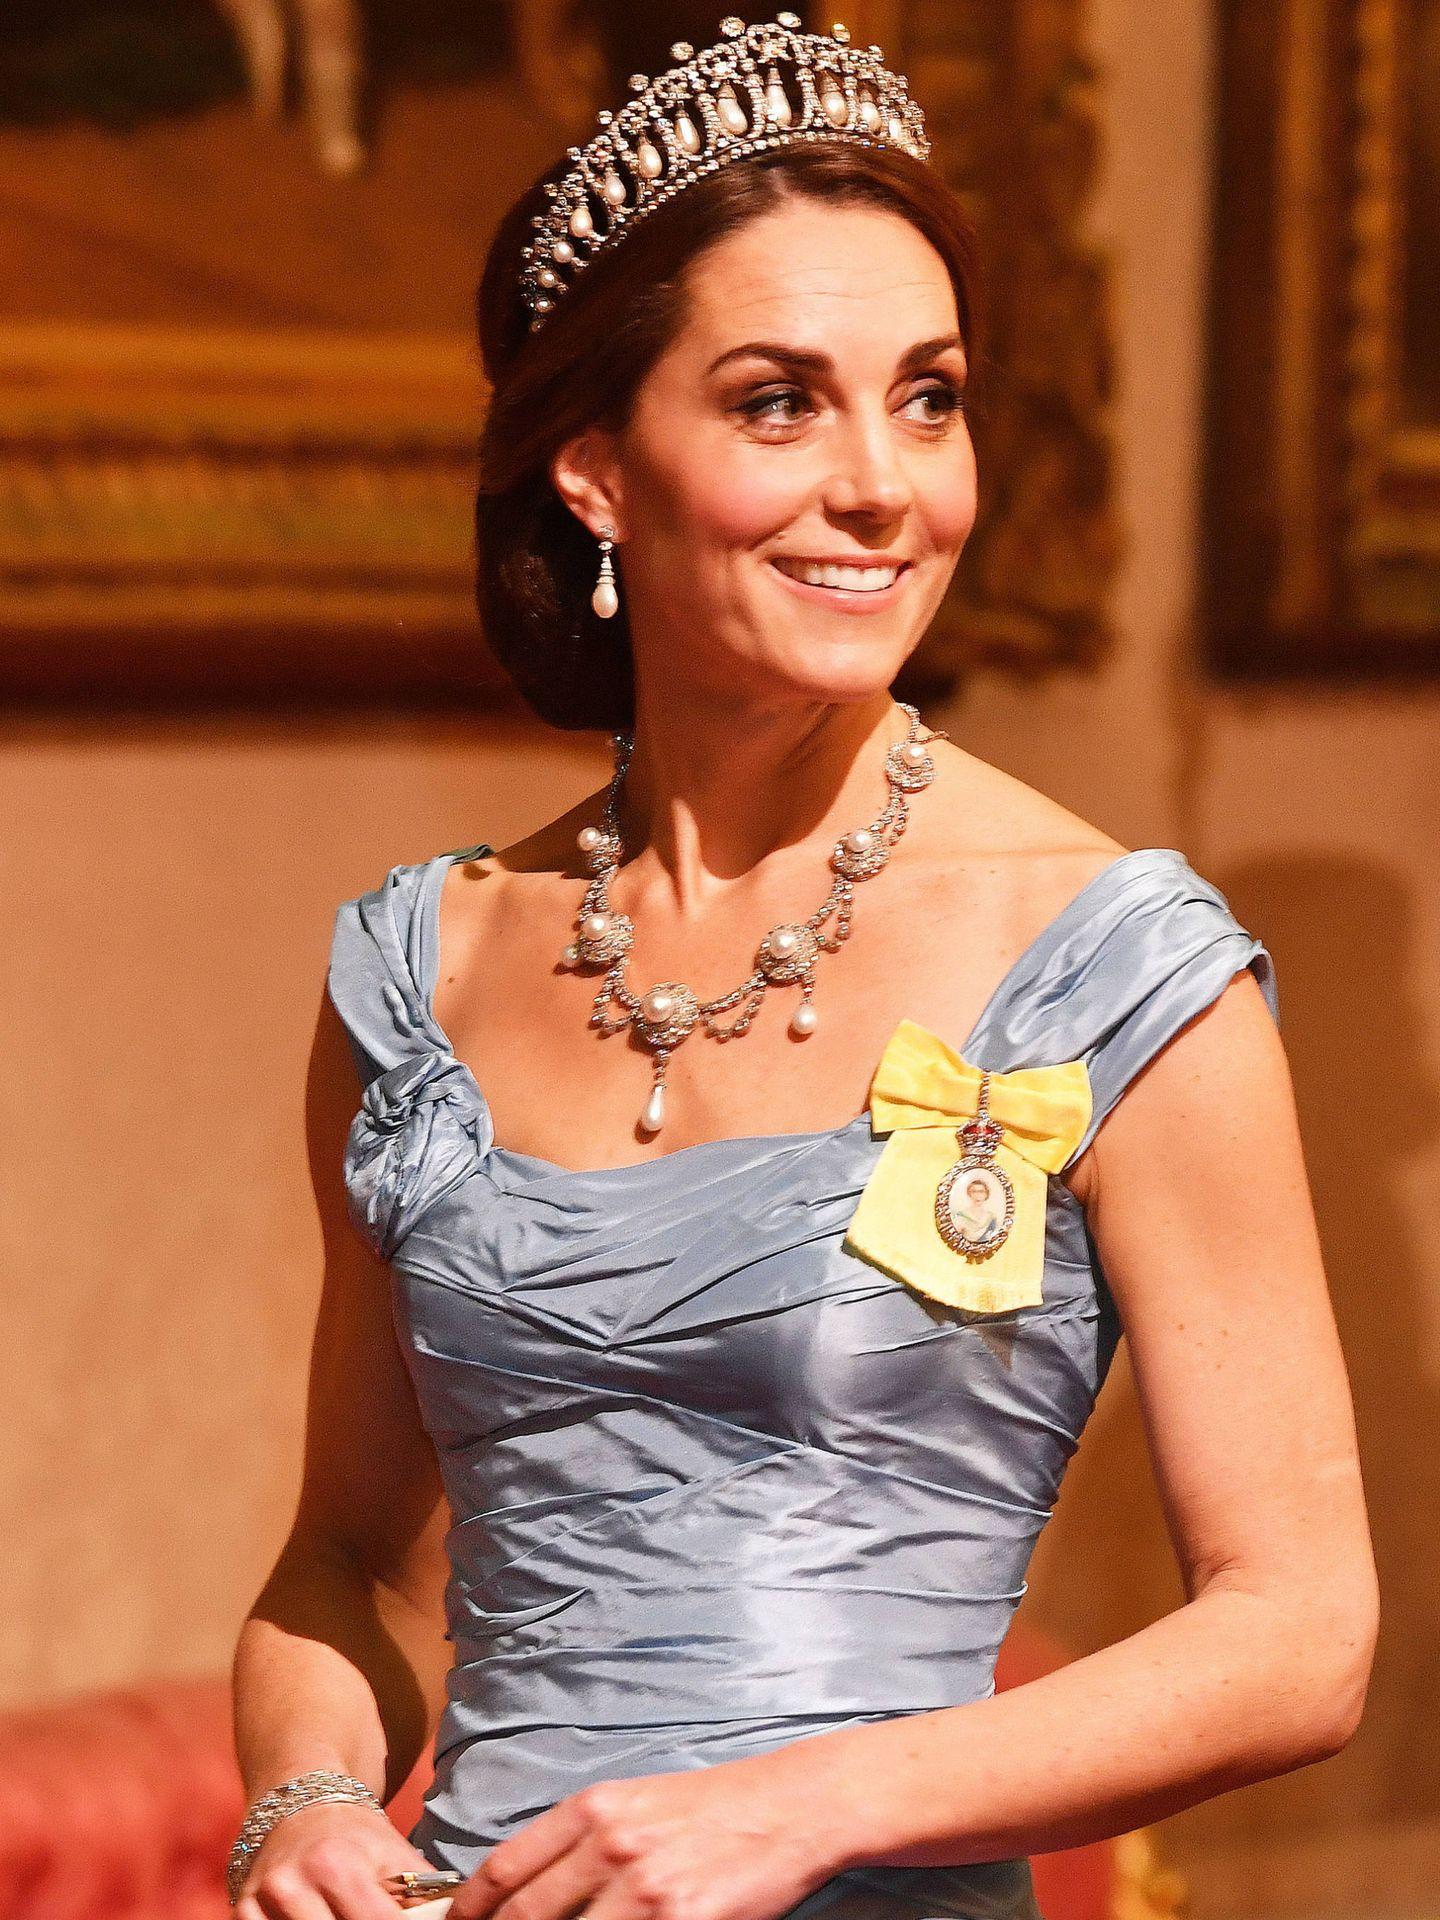 La duquesa de Cambridge. (Getty)